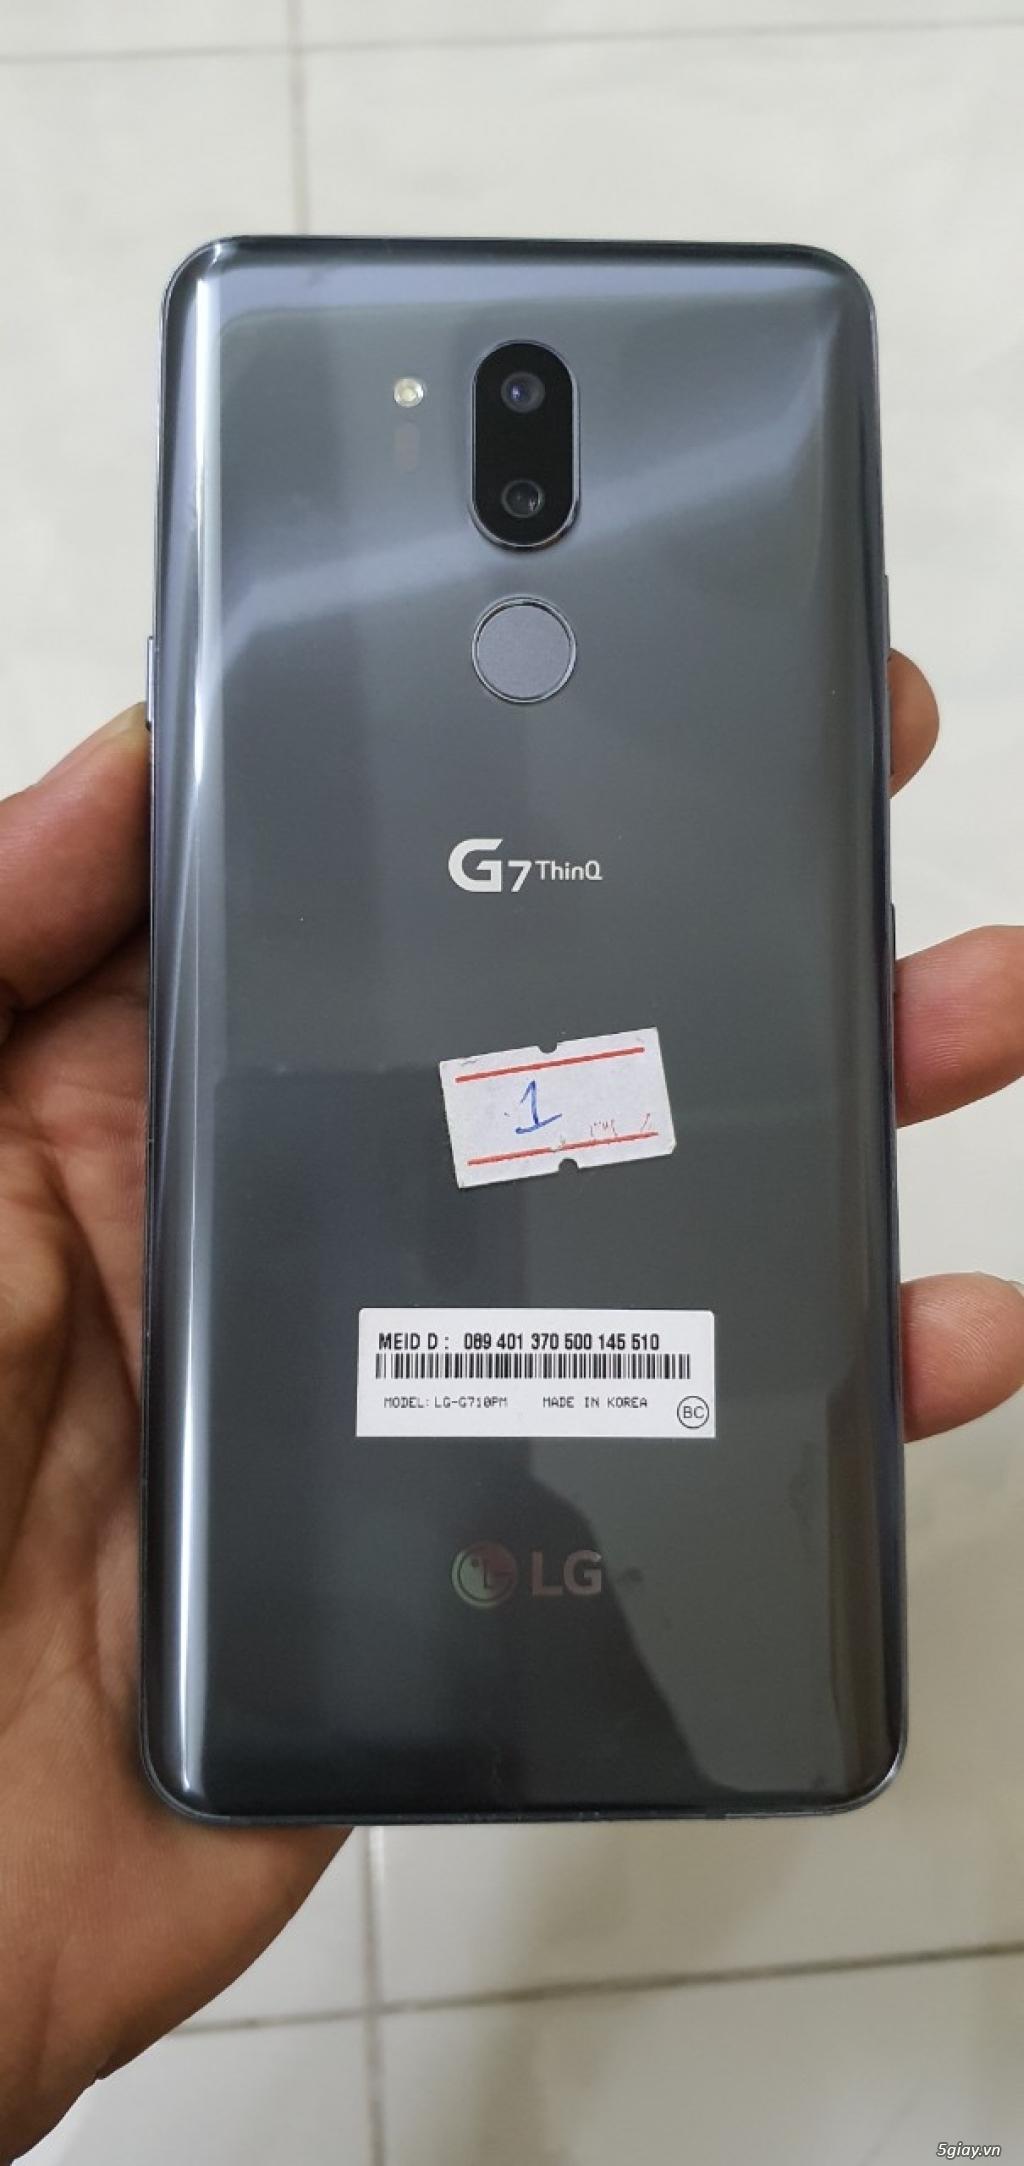 Bán LG G7 ThinQ 4Gb/64GB Hàn Quốc Likenew